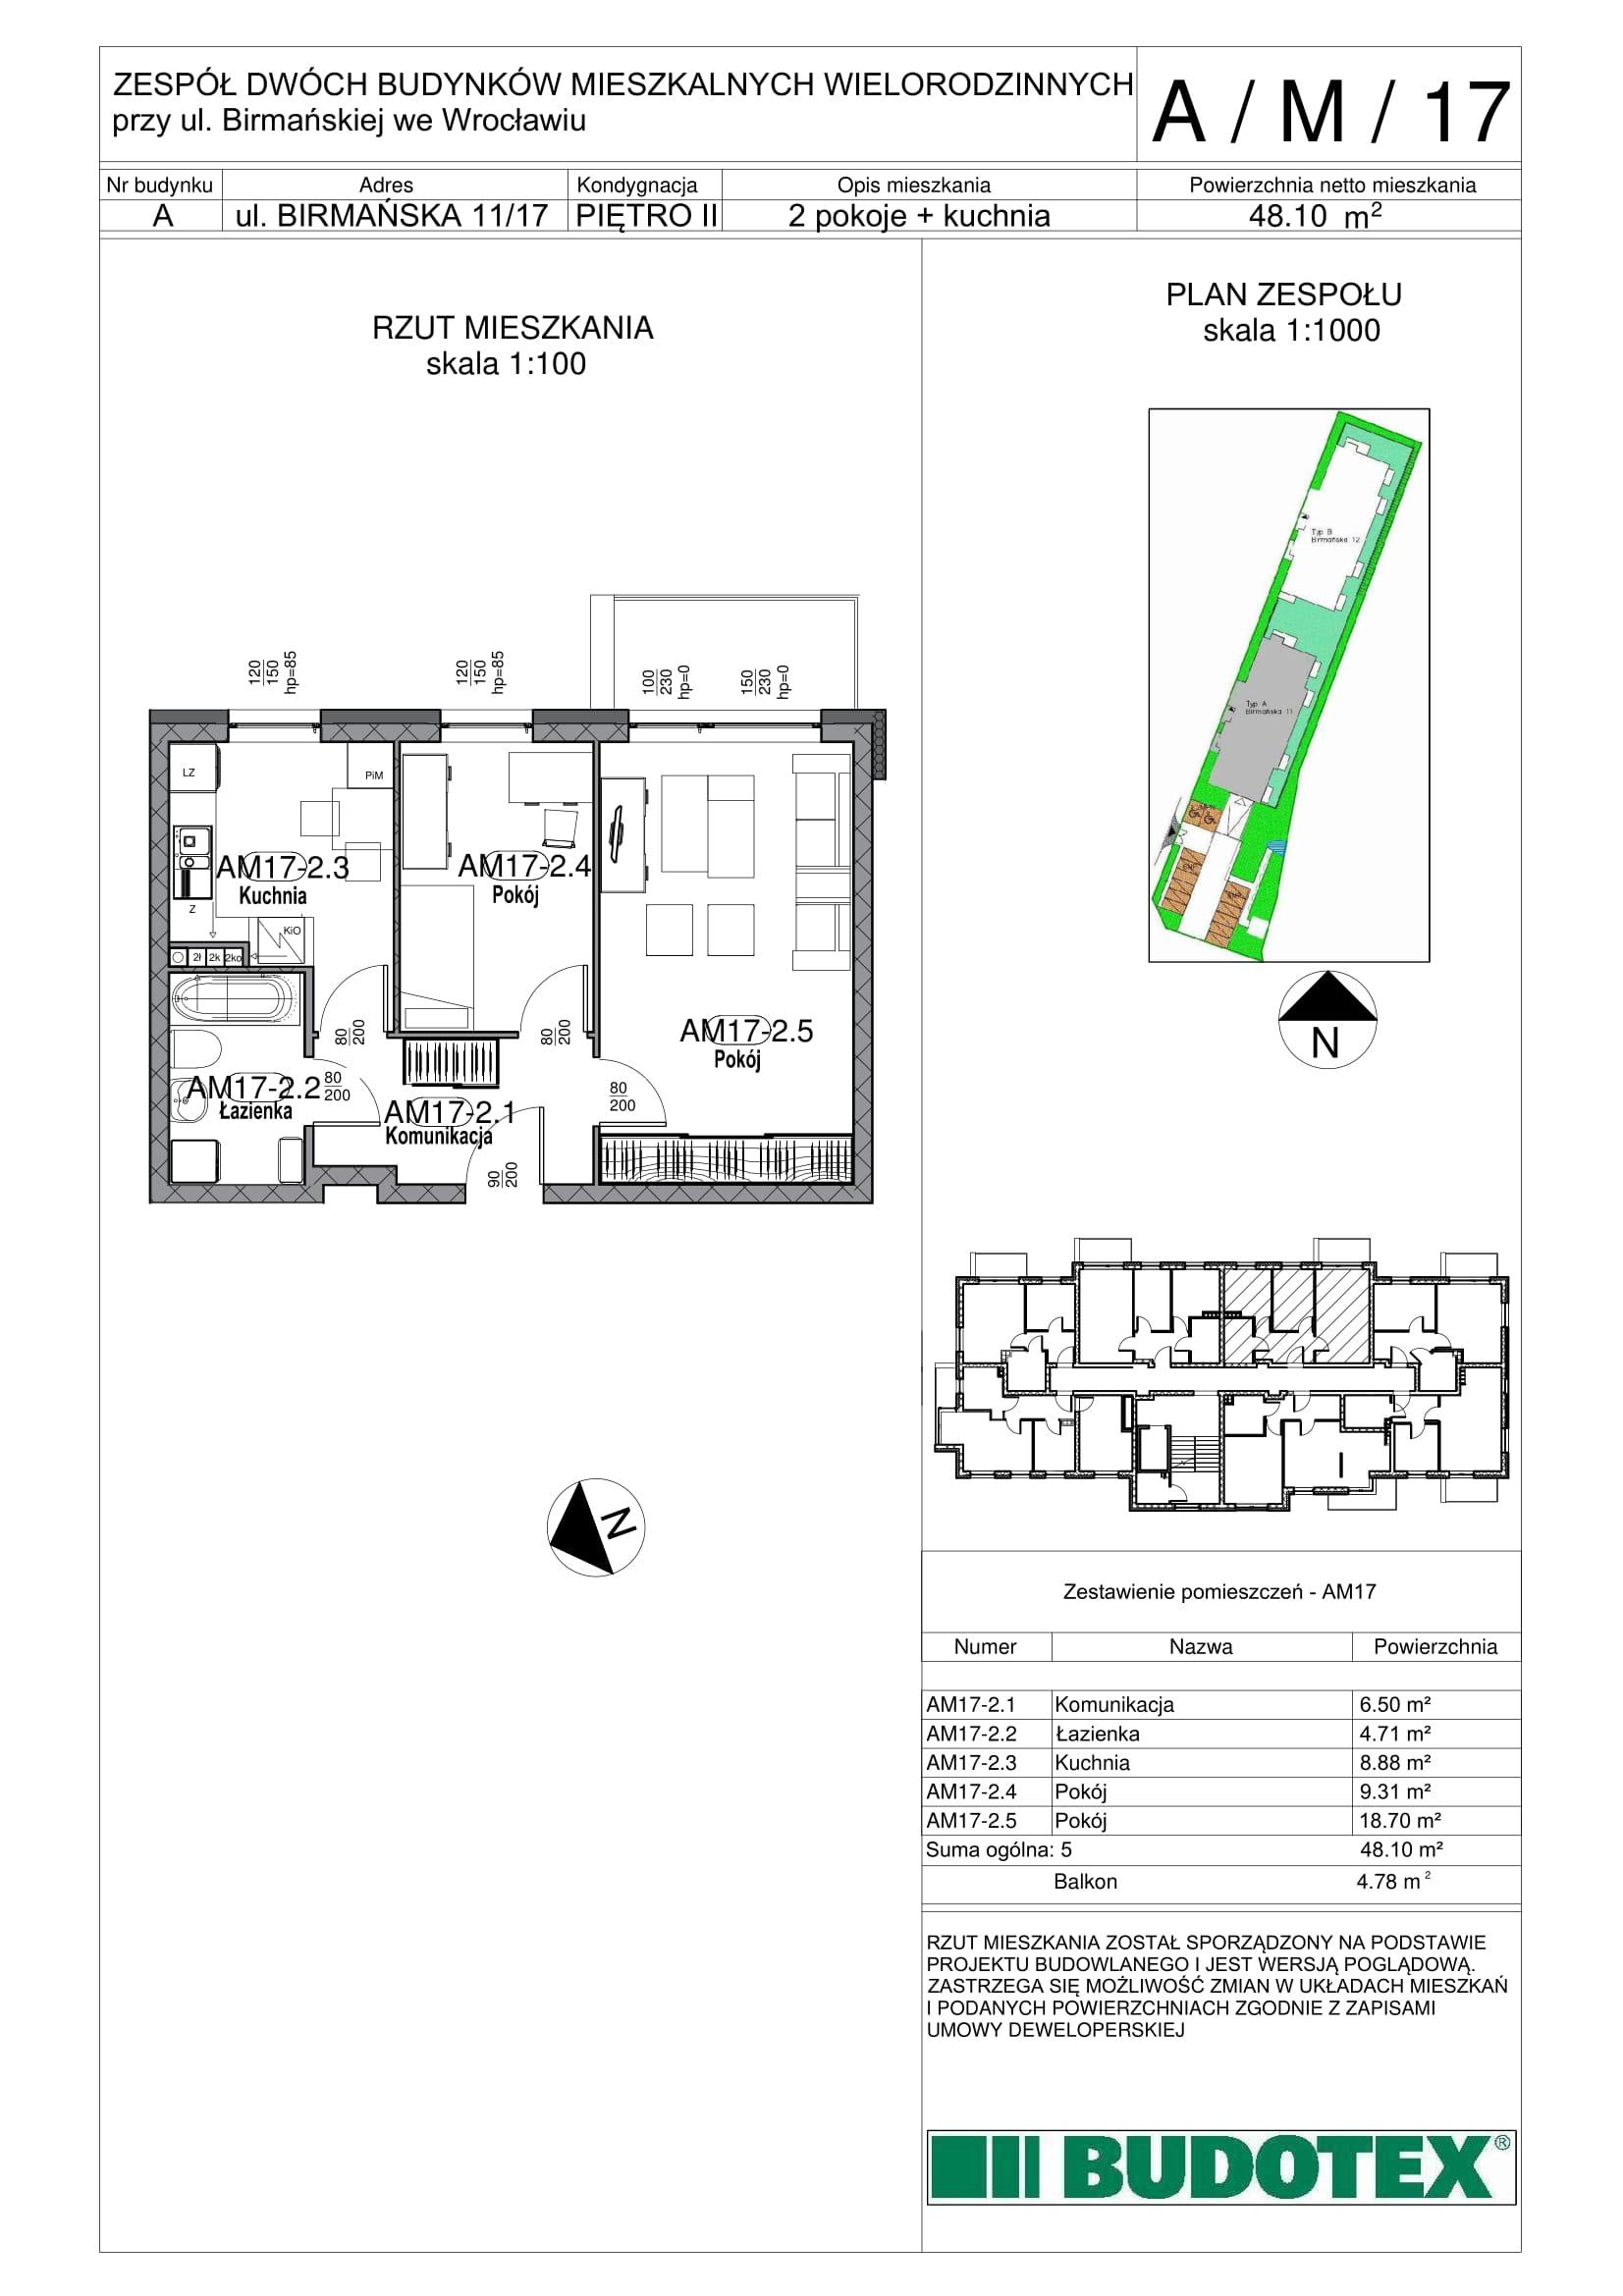 Mieszkanie nr A/M/17